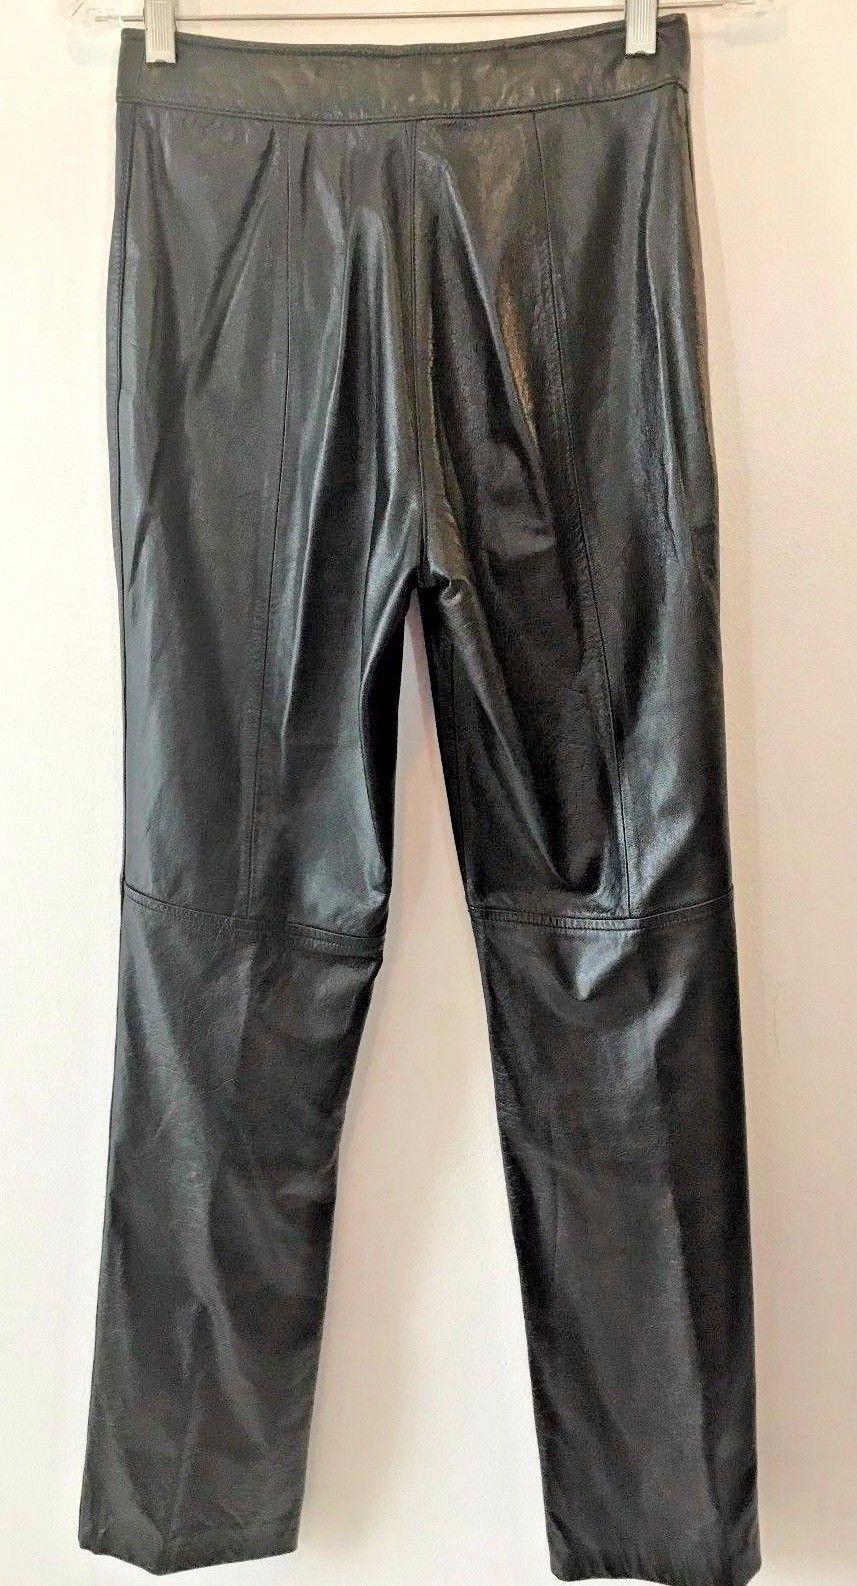 Wilsons Black Genuine Leather Womens High Waist Pants size XS 25.5x31.5 P10